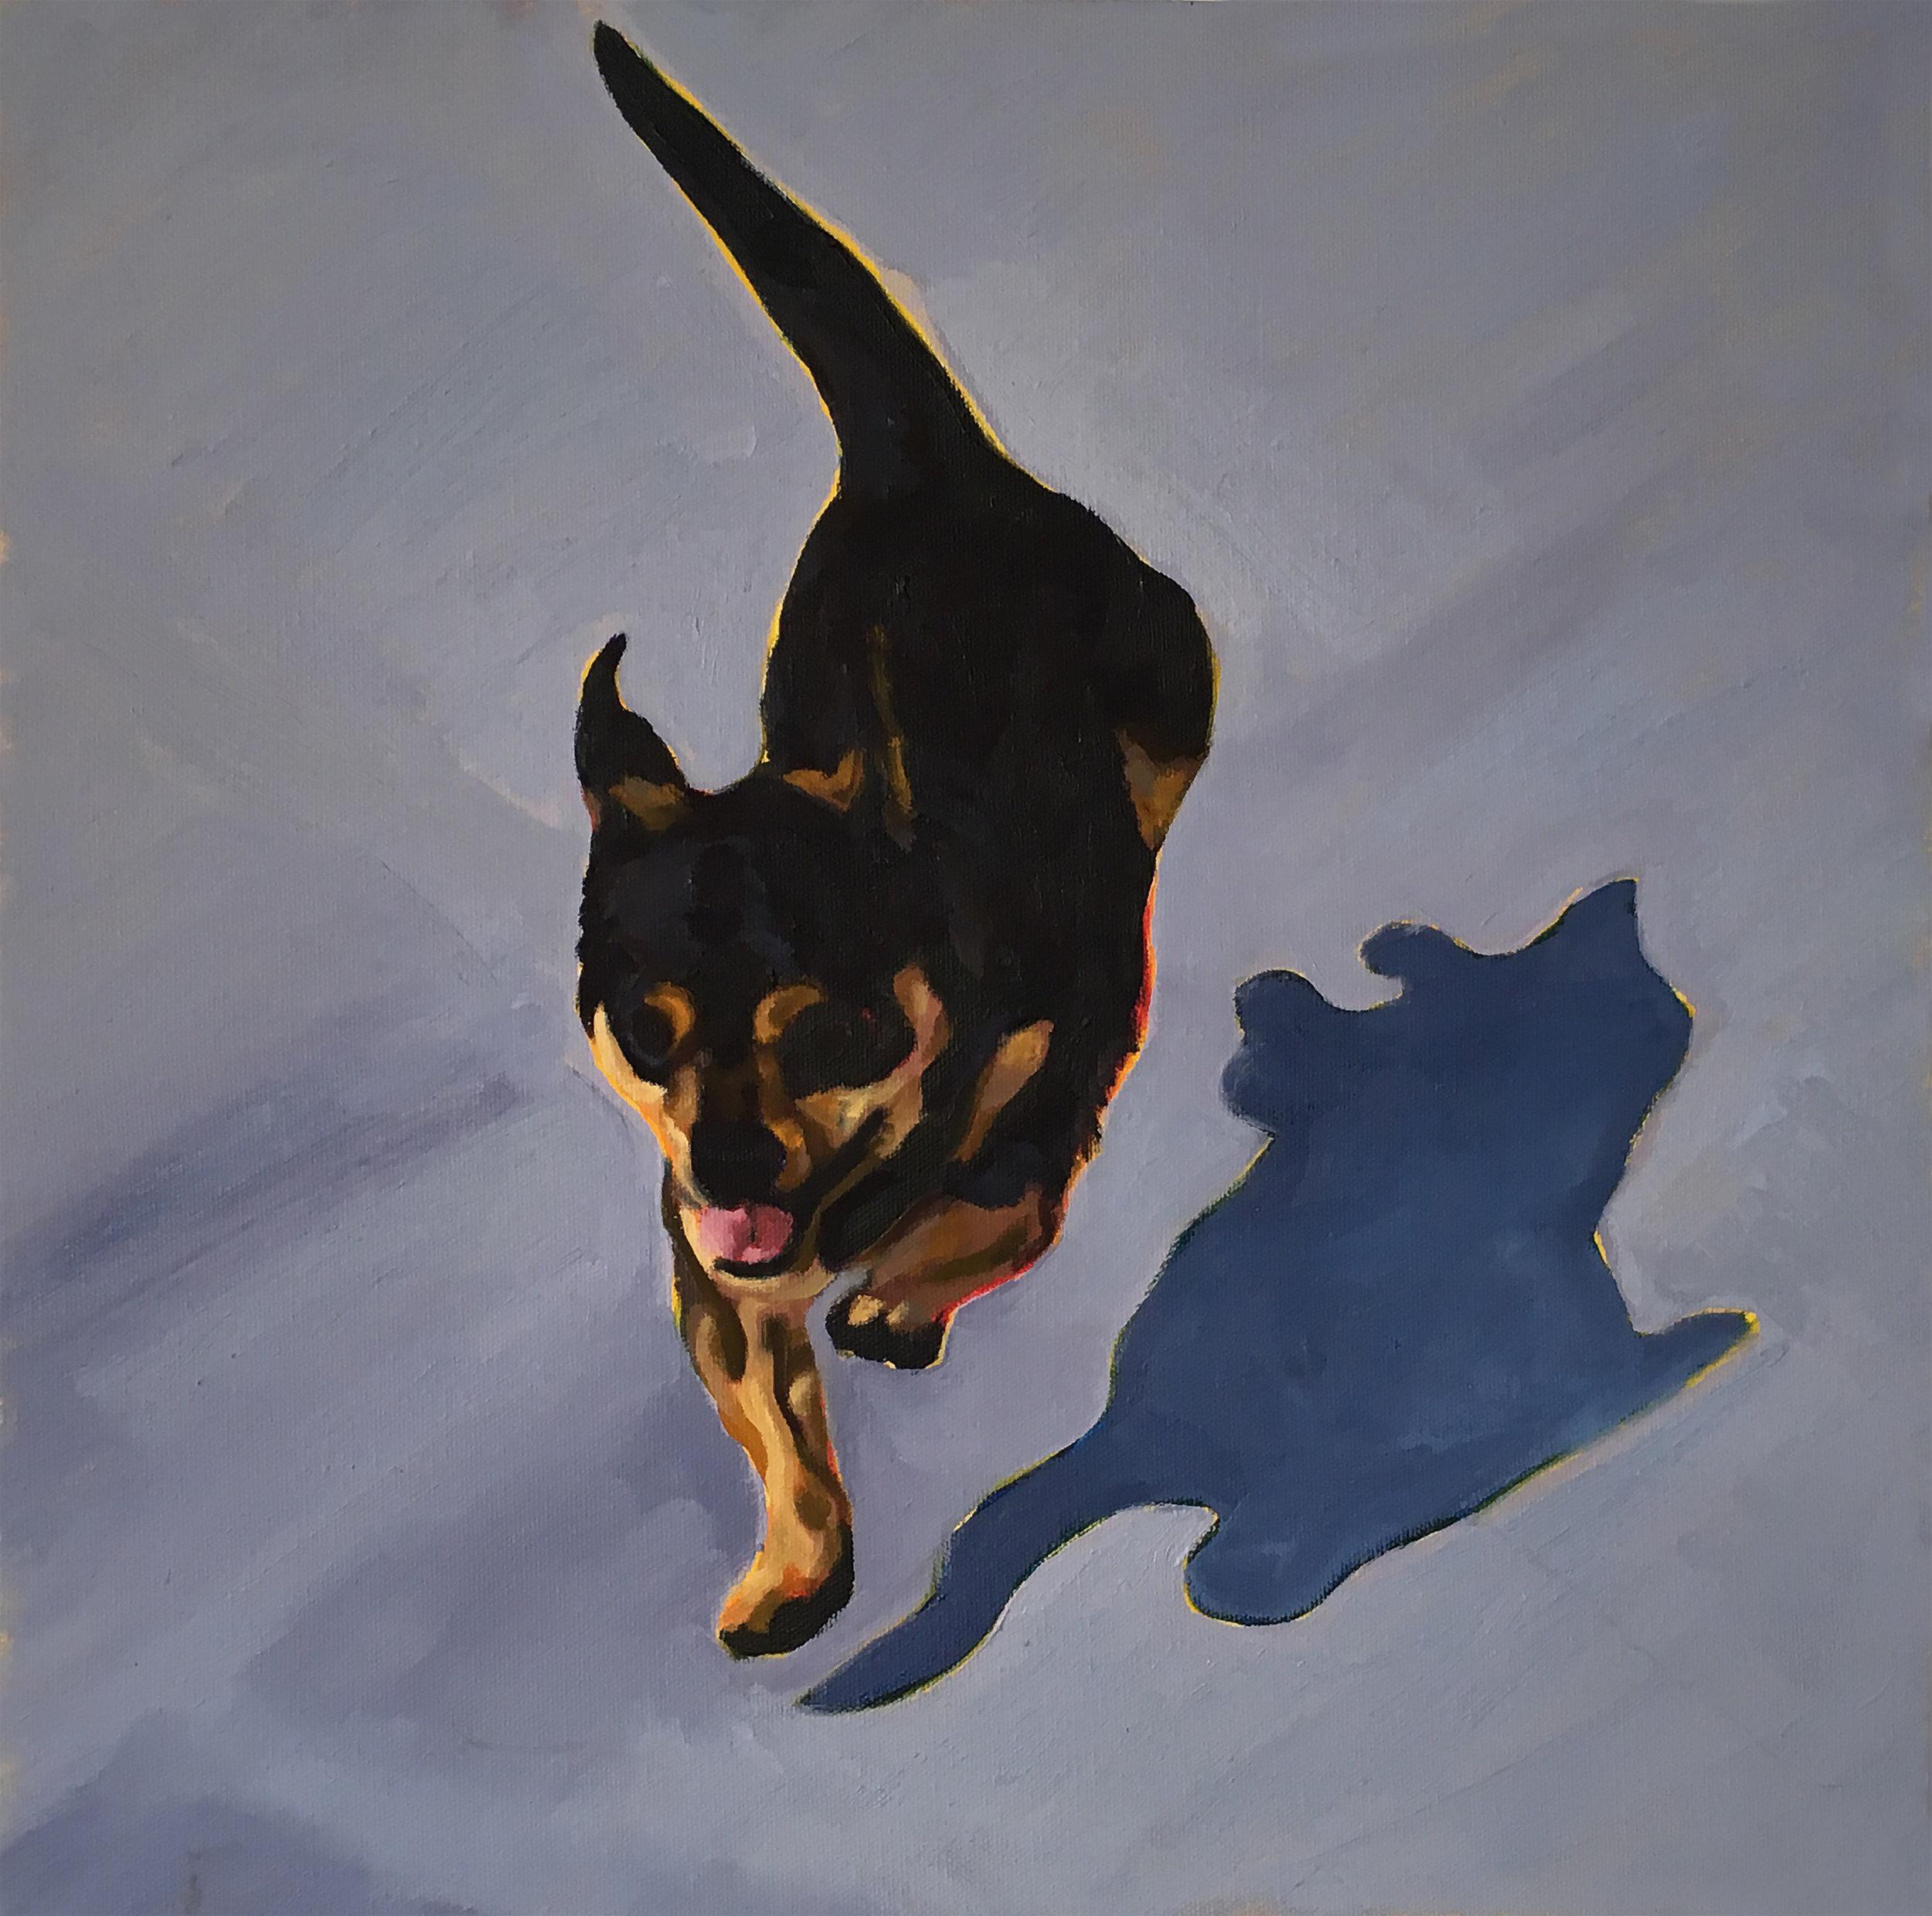 Rocket Landing  16 x 16  Oil on Canvas  2009